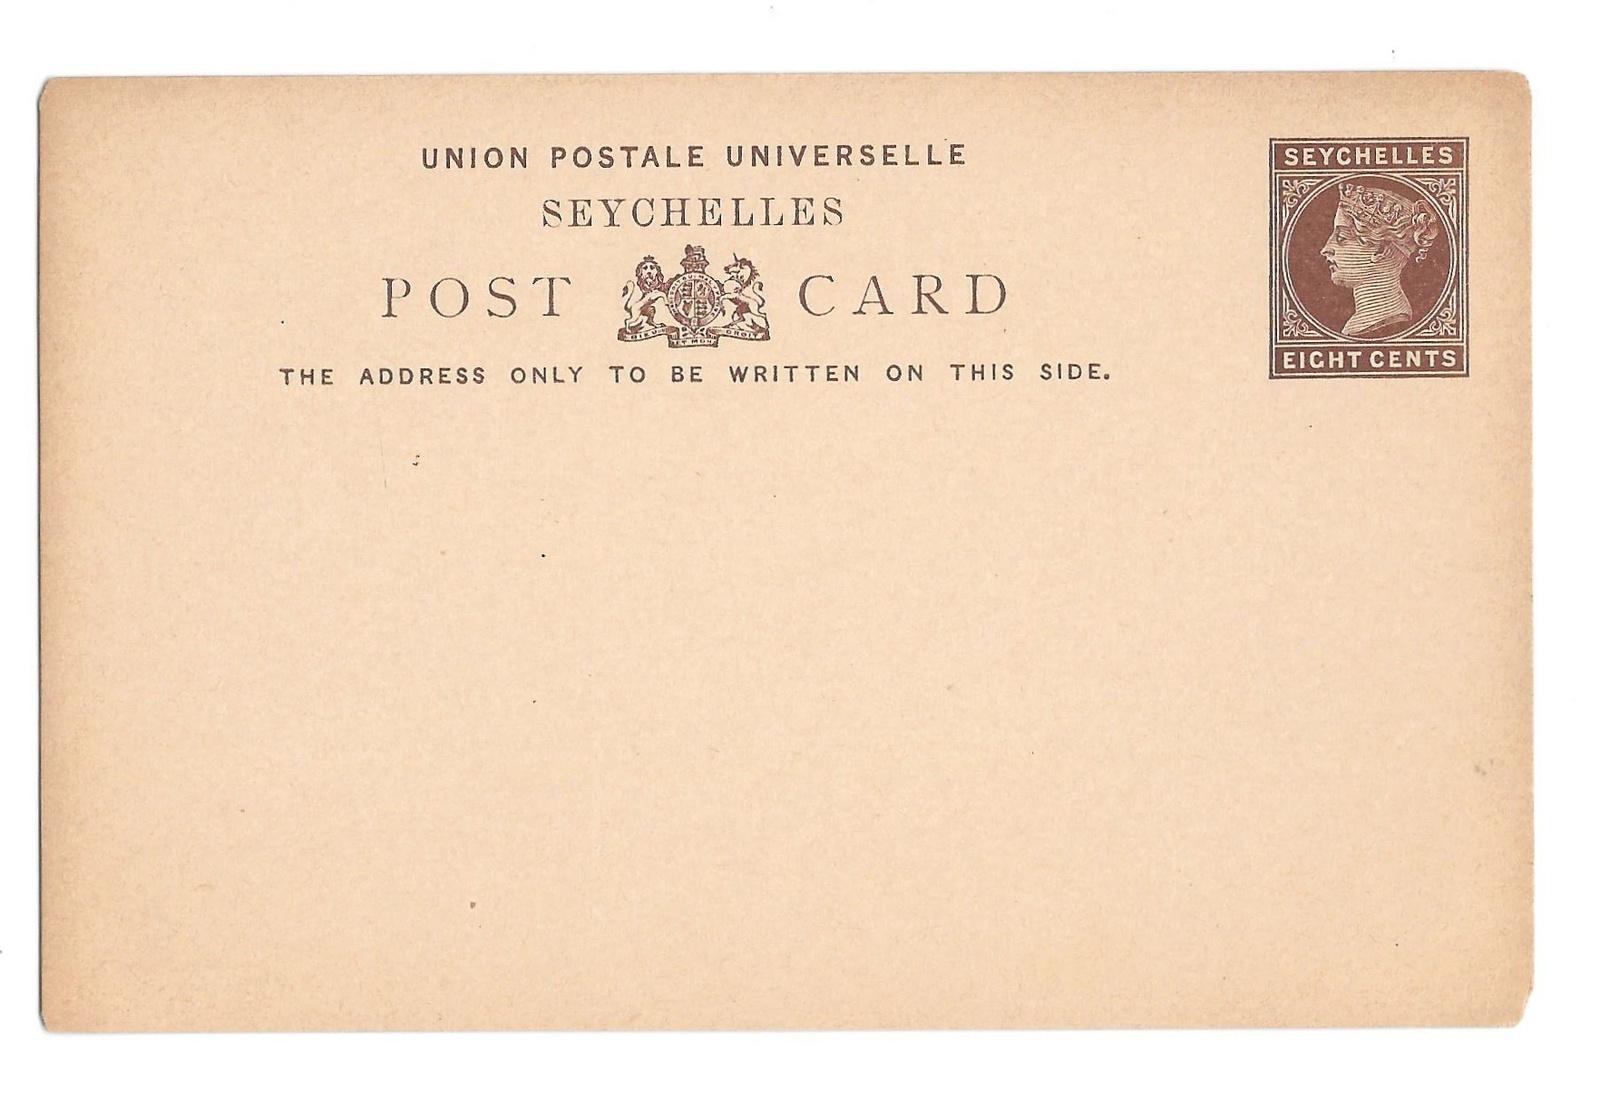 British Seychelles 1890 QV 4c and 8c 2 UPU Postal Stationery Card image 4